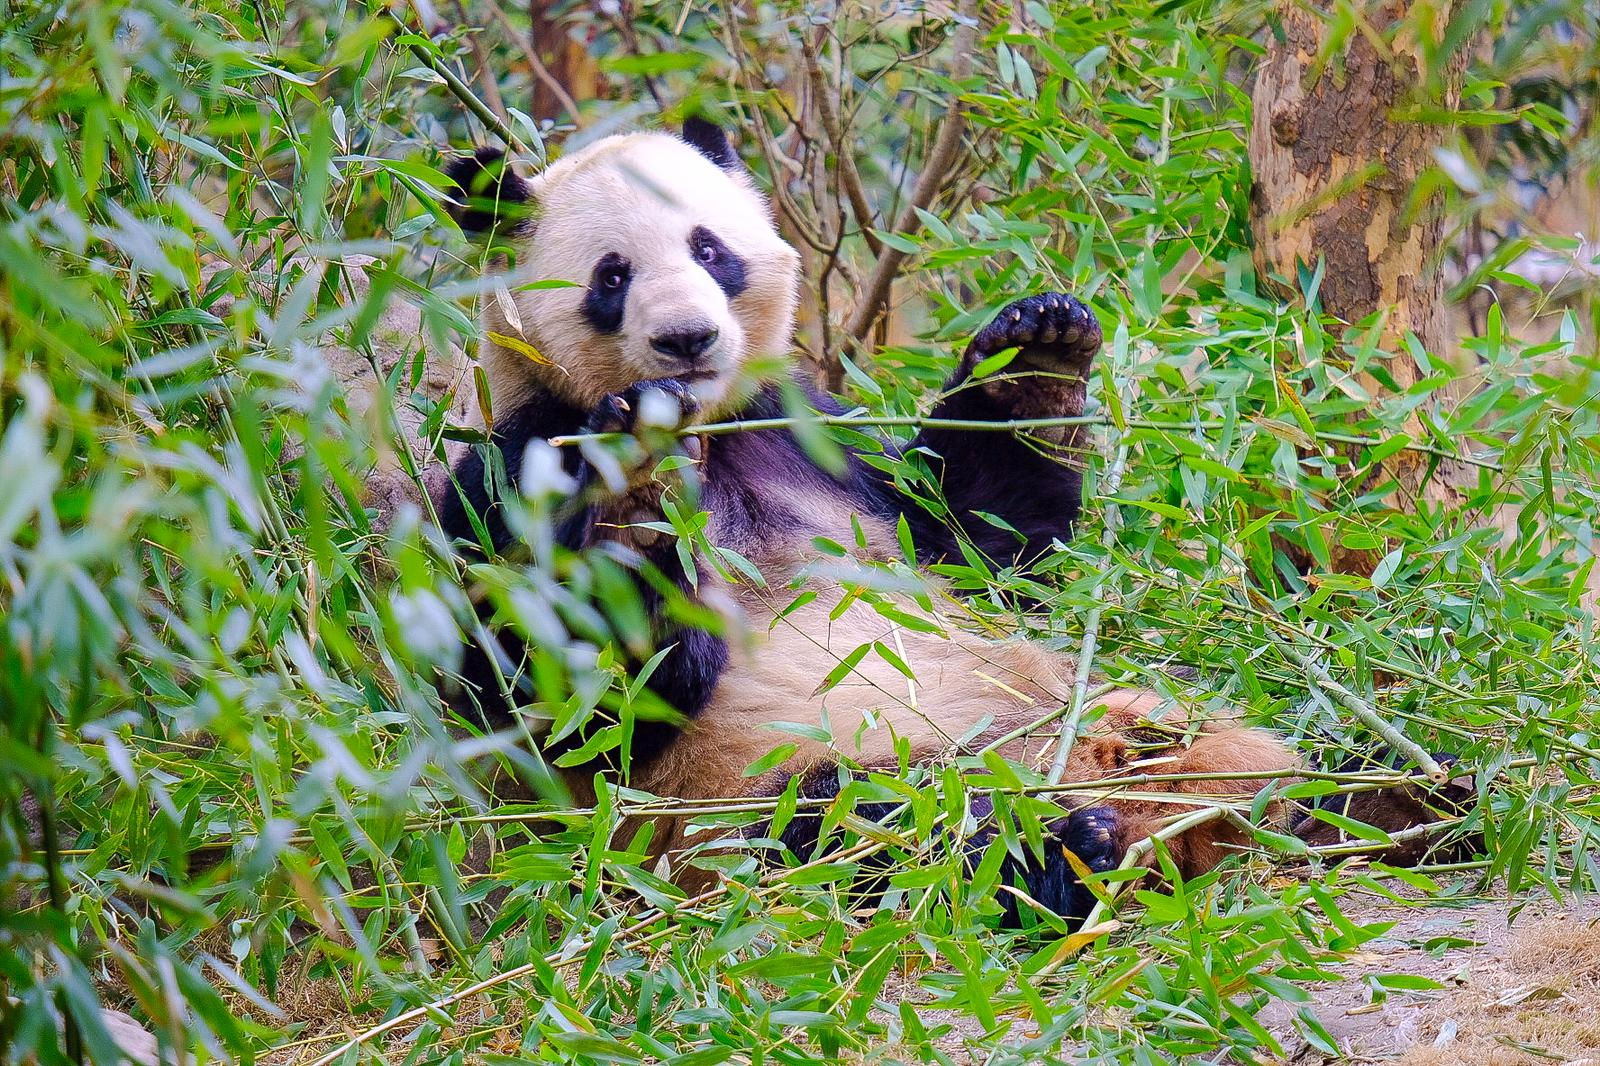 Panda Tour Utat Viaggi